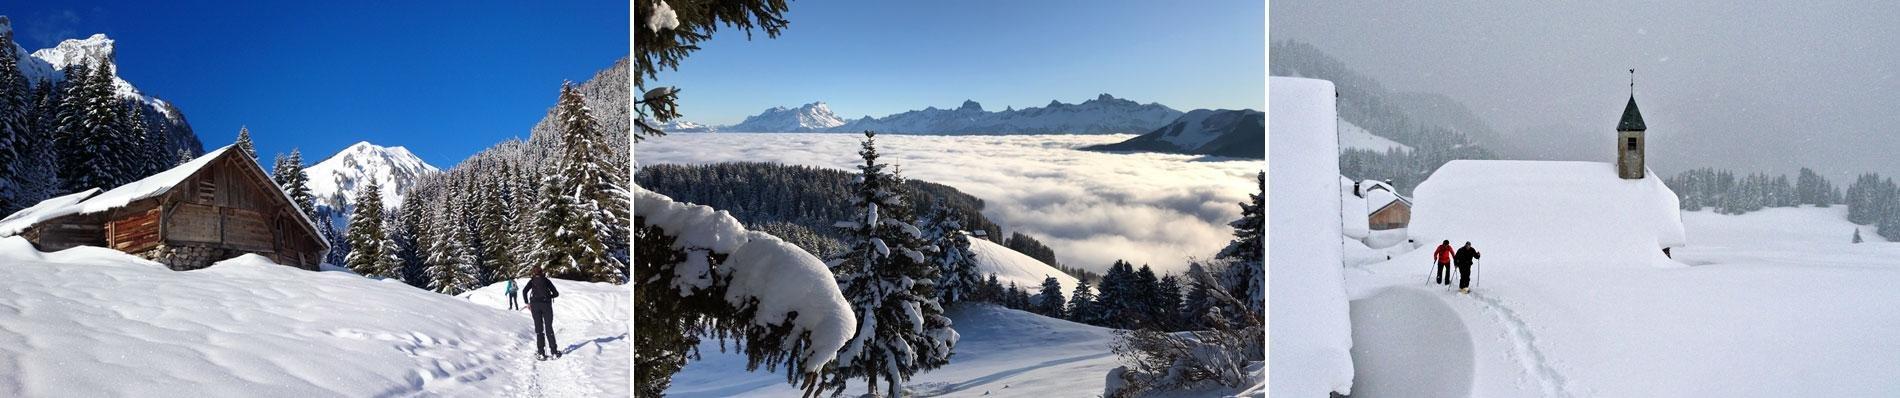 hotel esprit montagne skivakantie wintersport frankrijk portes du soleil